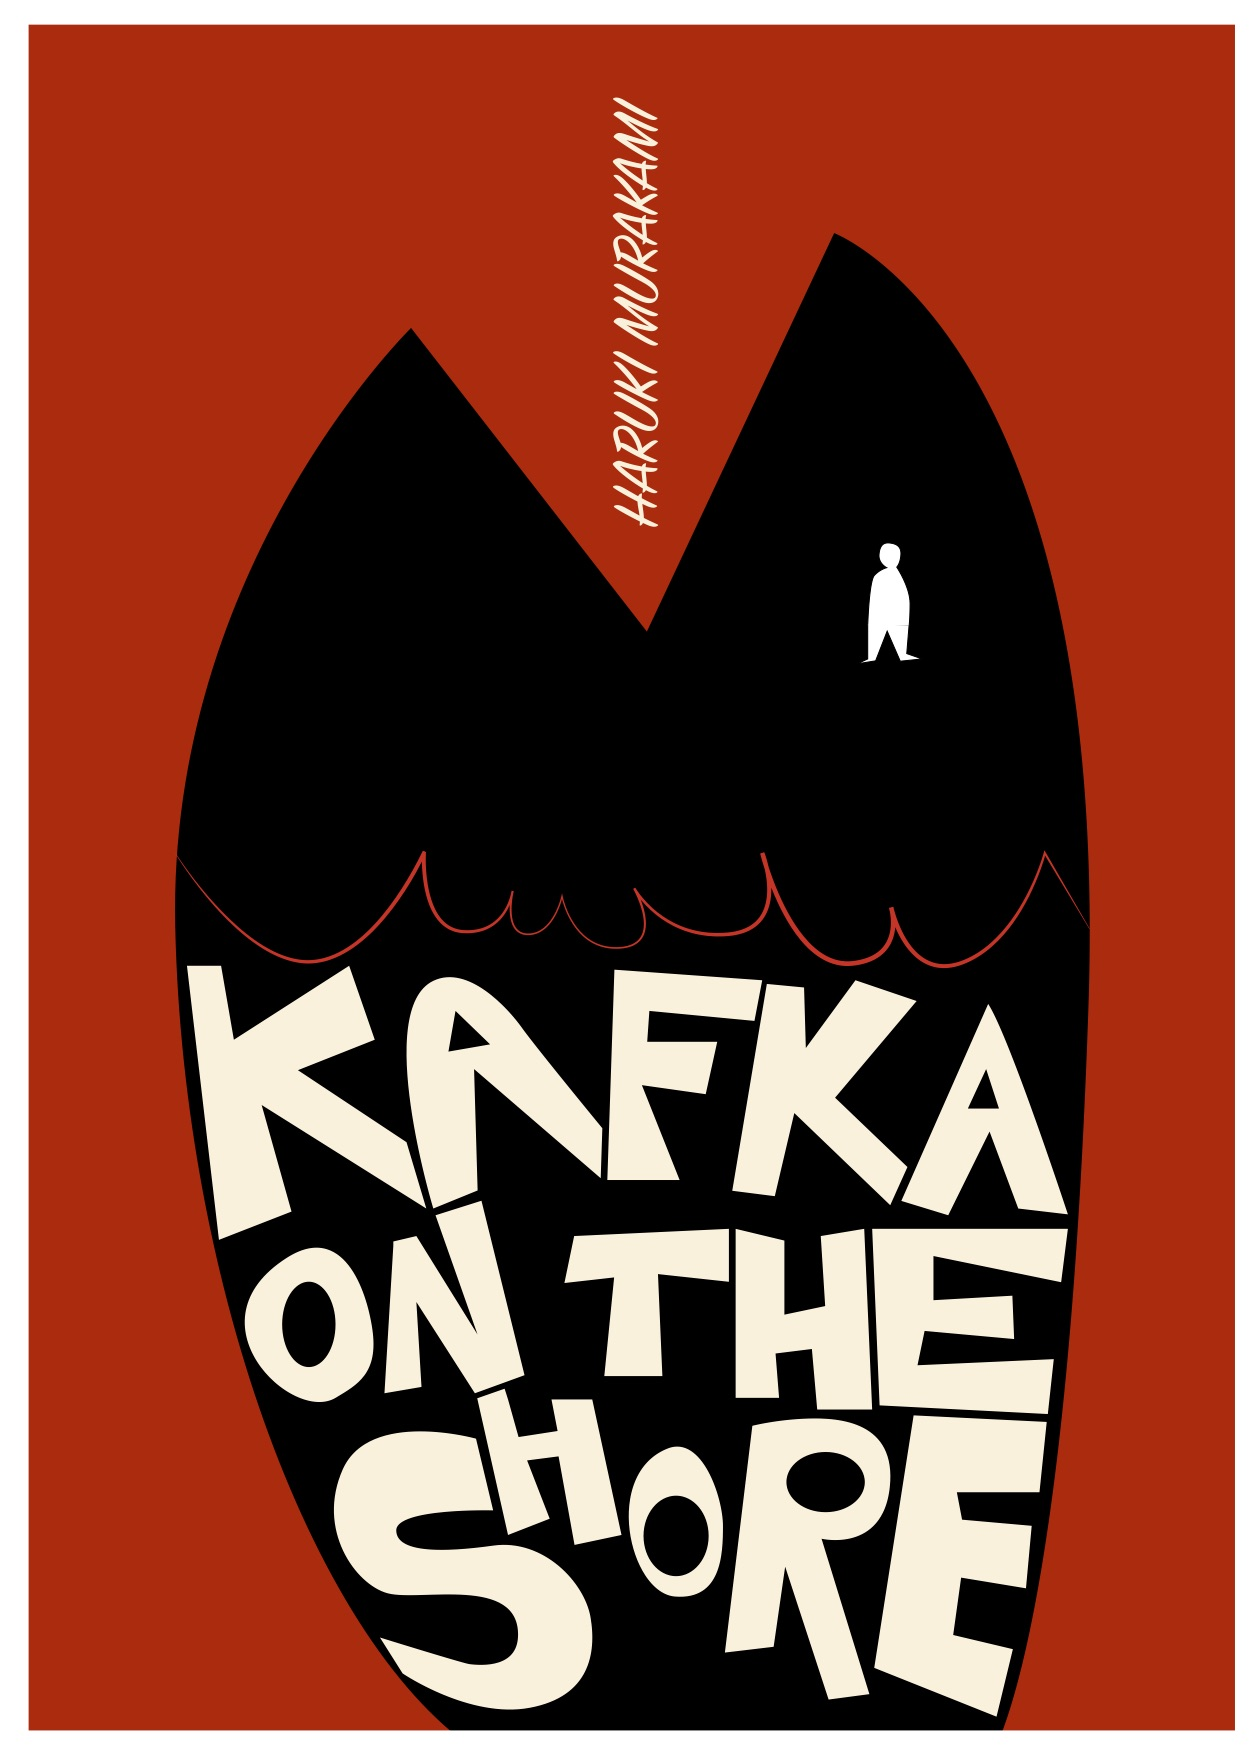 Illustration for the book Kafka on the shore - Haruki Murakami